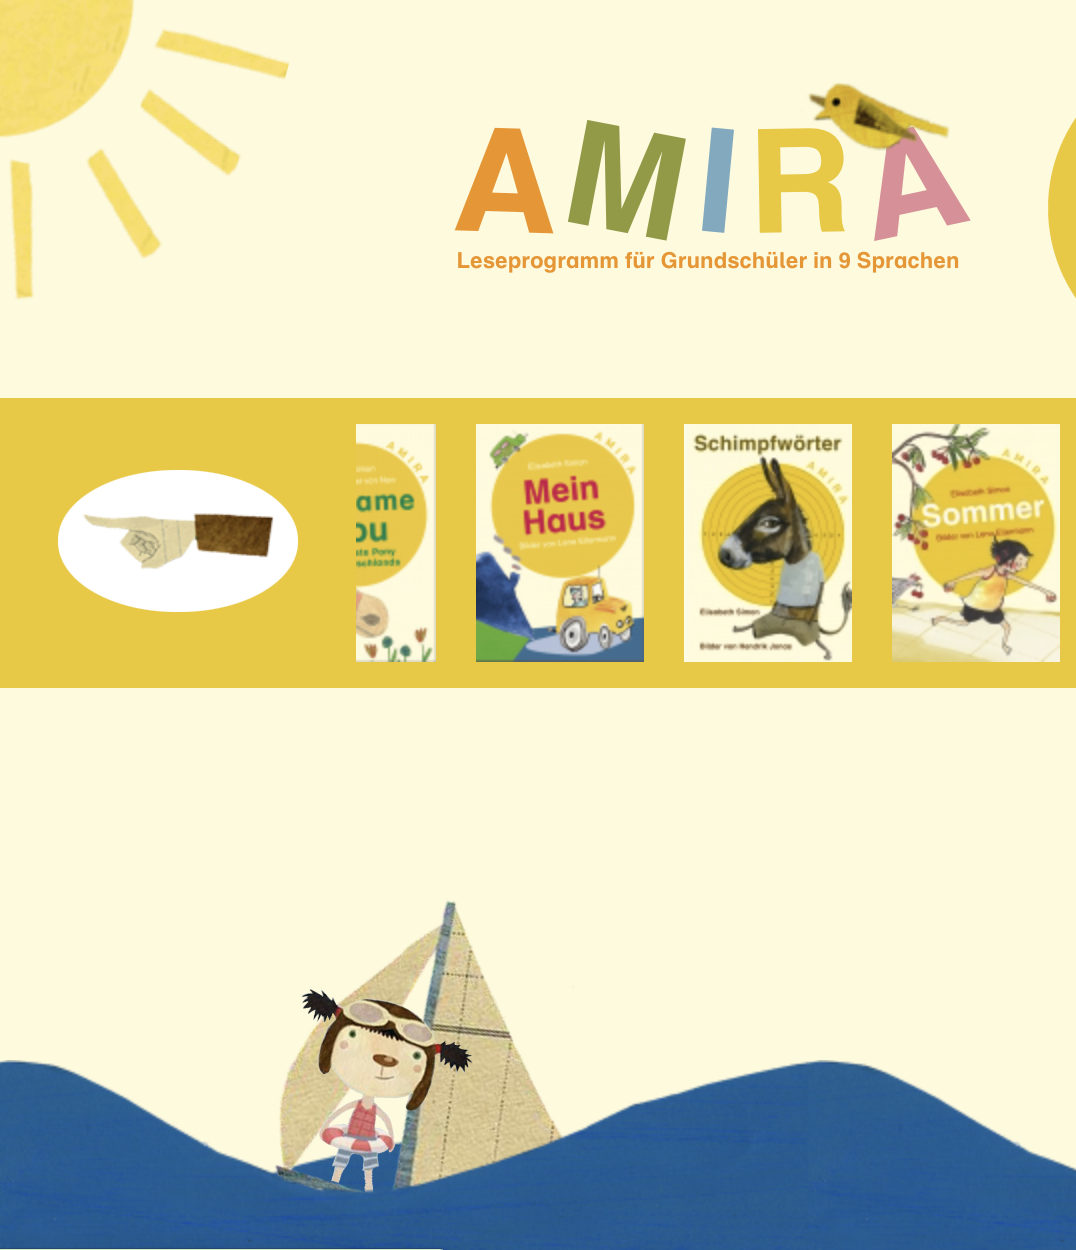 Preview image for LOM object Amira - Leseprogramm in neun Sprachen